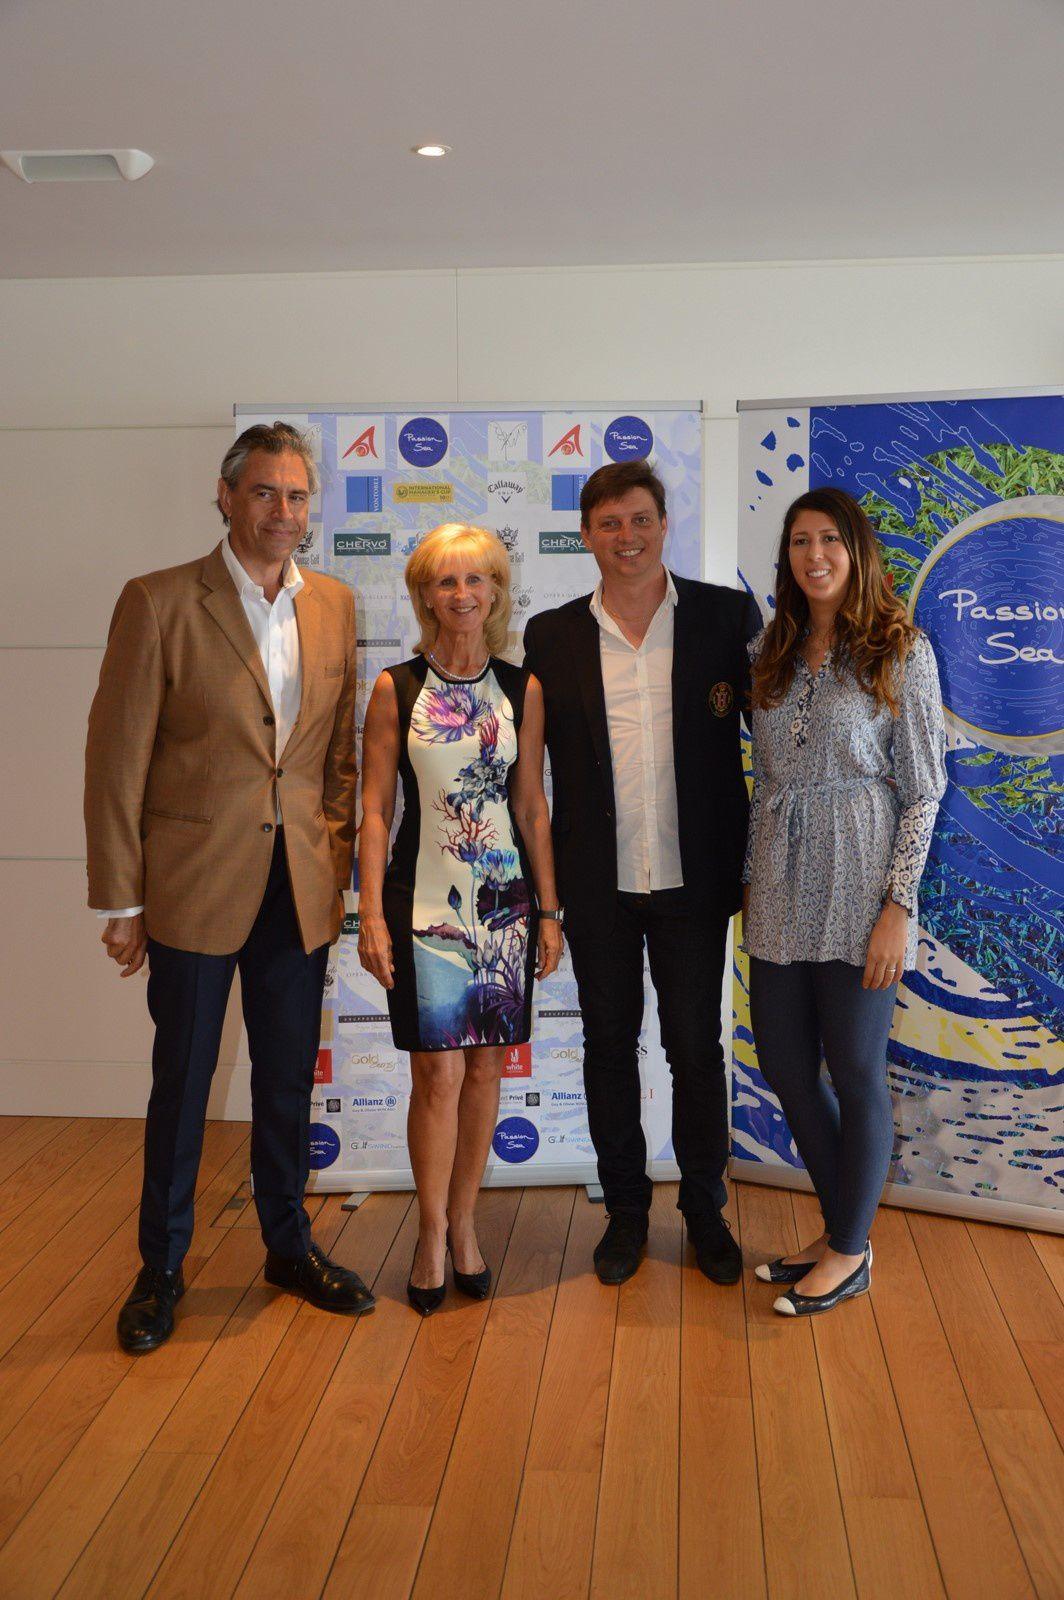 MONTE CARLO GOLF CLUB: TOURNOI CARITATIF DEDIE A NOTRE PLANETE BLEUE